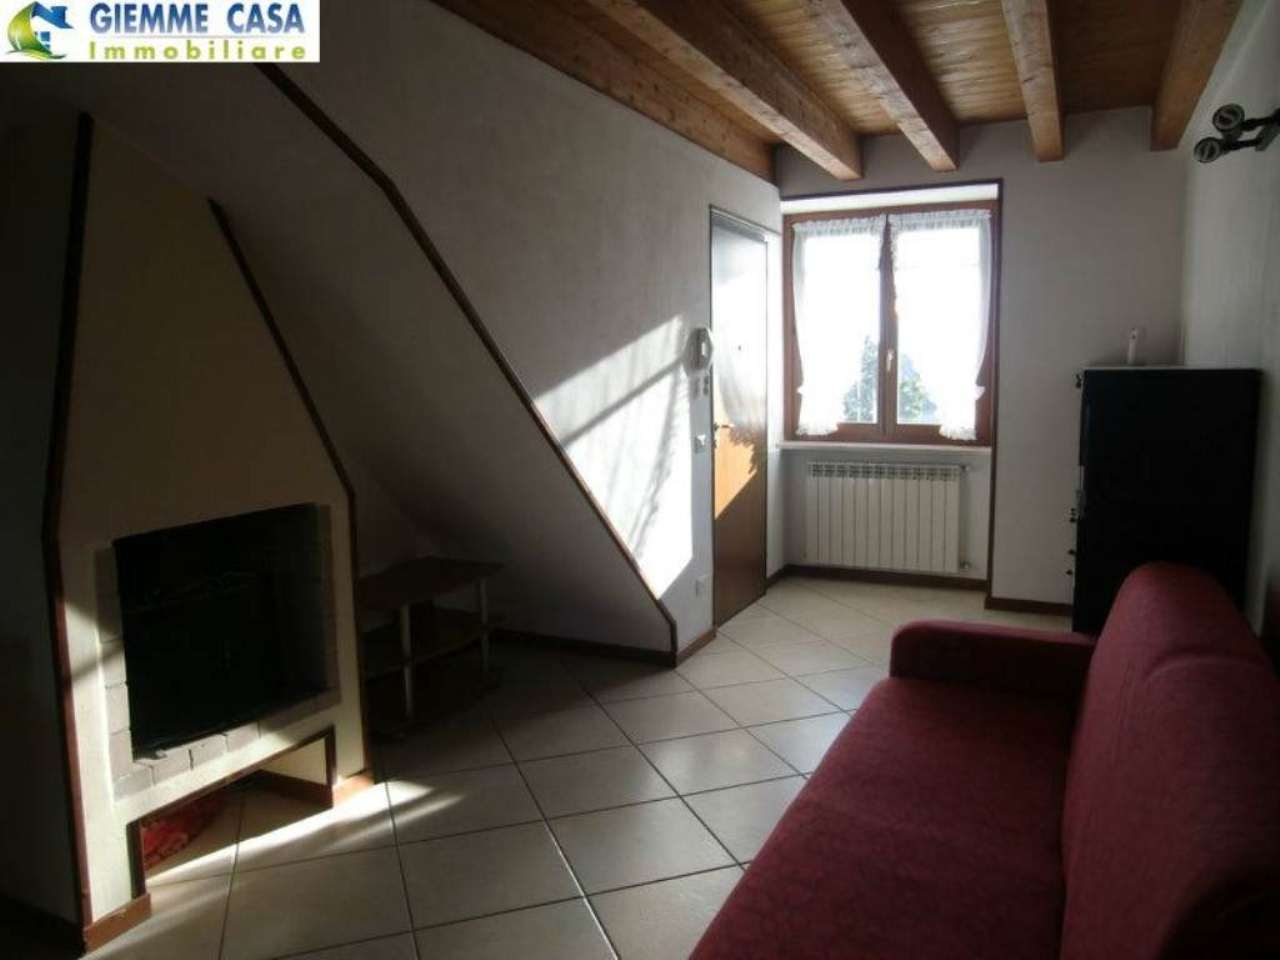 Bilocale Lonato Del Garda Via Gerardi 4